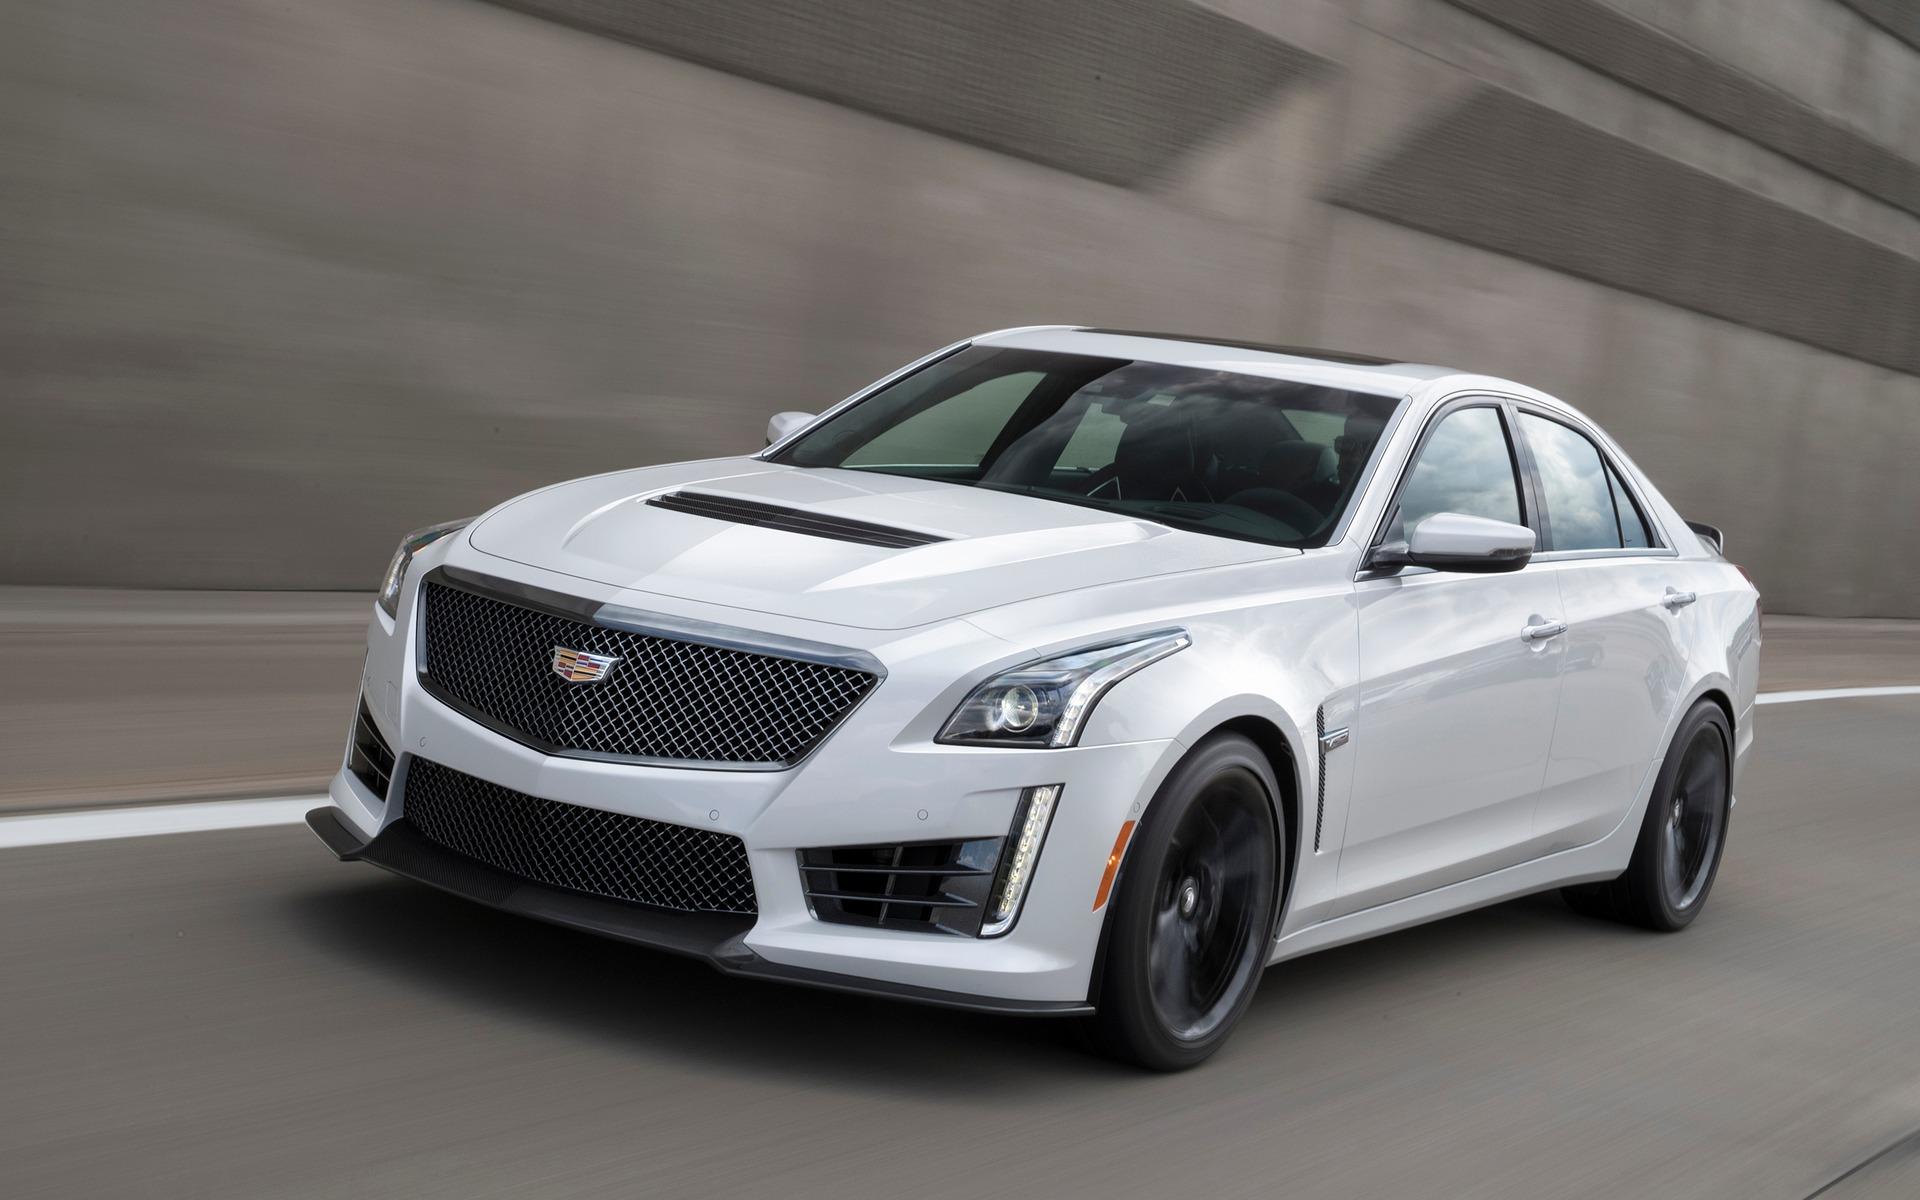 2017 Cadillac CTS-V Carbon Black